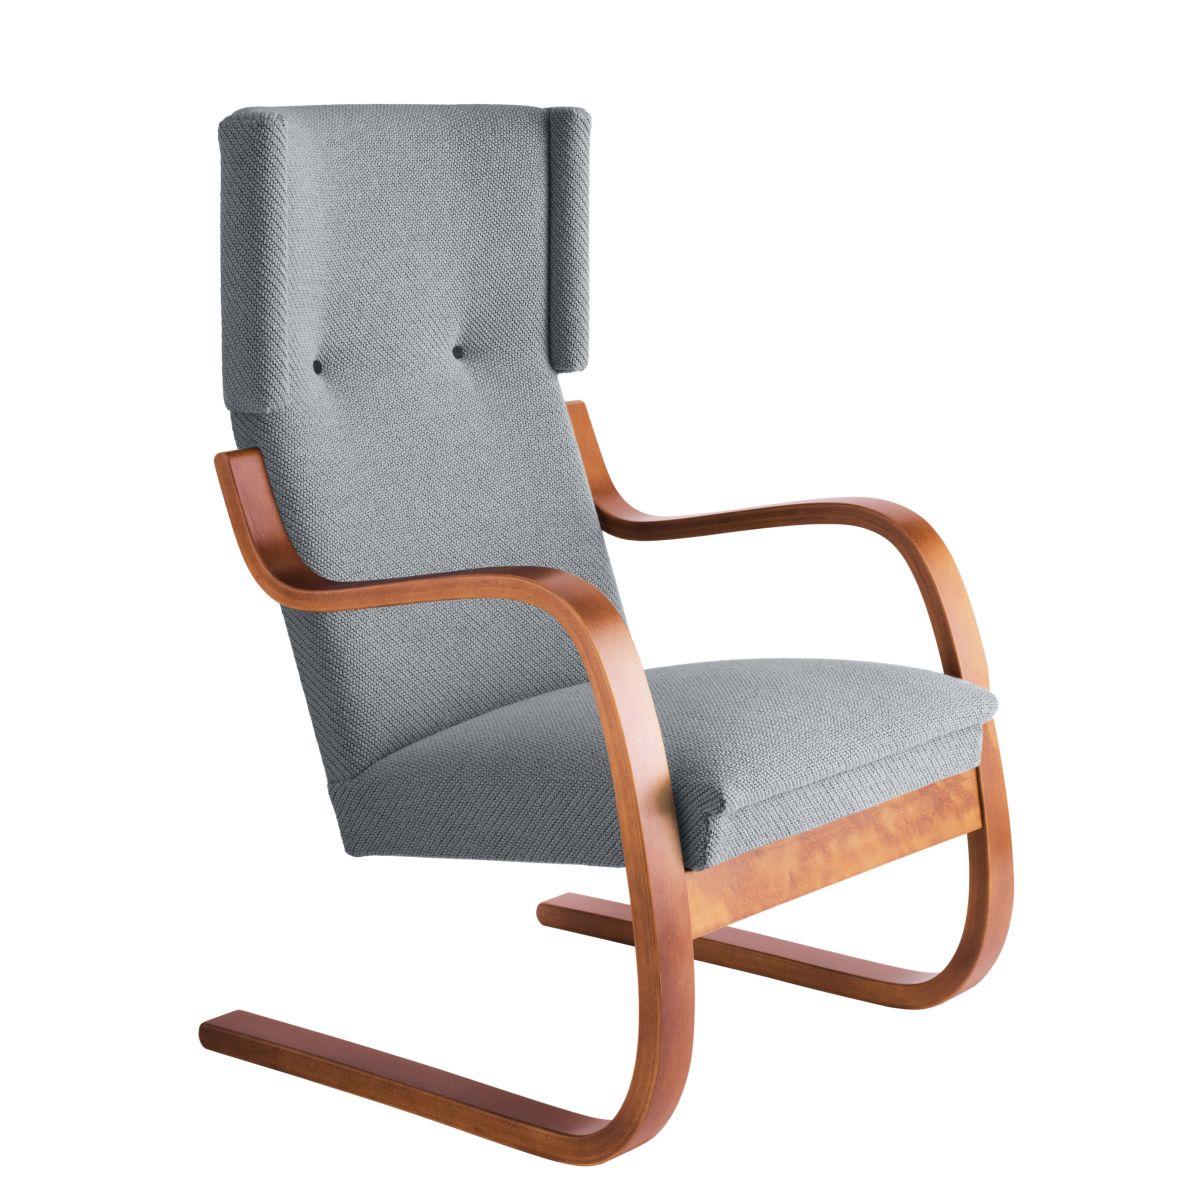 Armchair 401 Walnut Stain Seat Fabric Upholstery Artek Grey 2494504